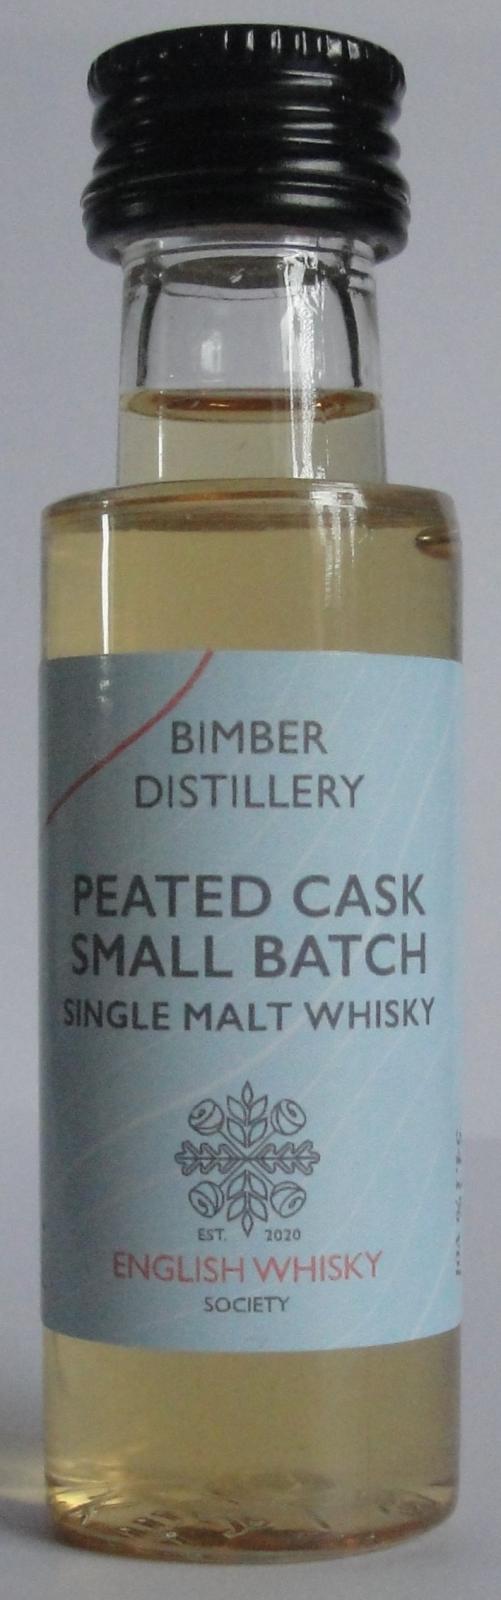 Bimber Peated Cask - Small Batch TDT